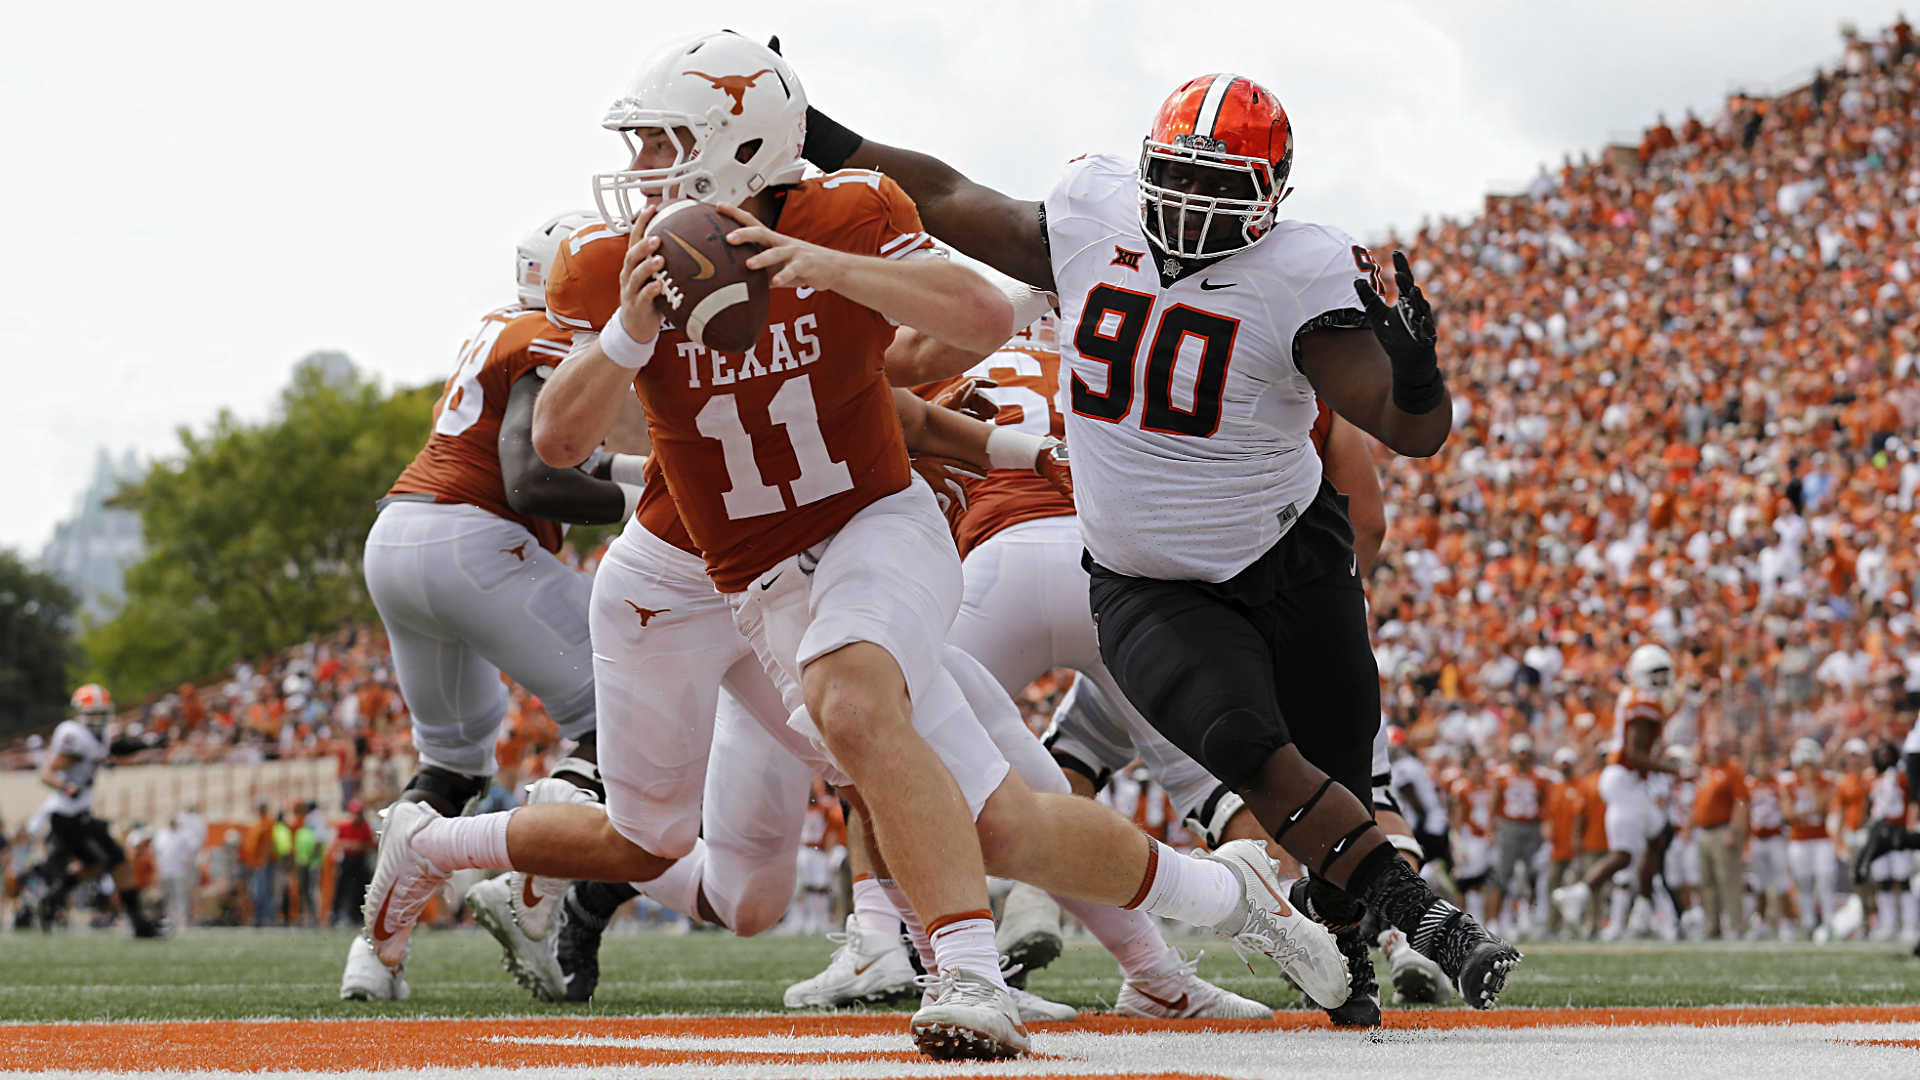 Texas' pain won't end under Tom Herman until close losses ...